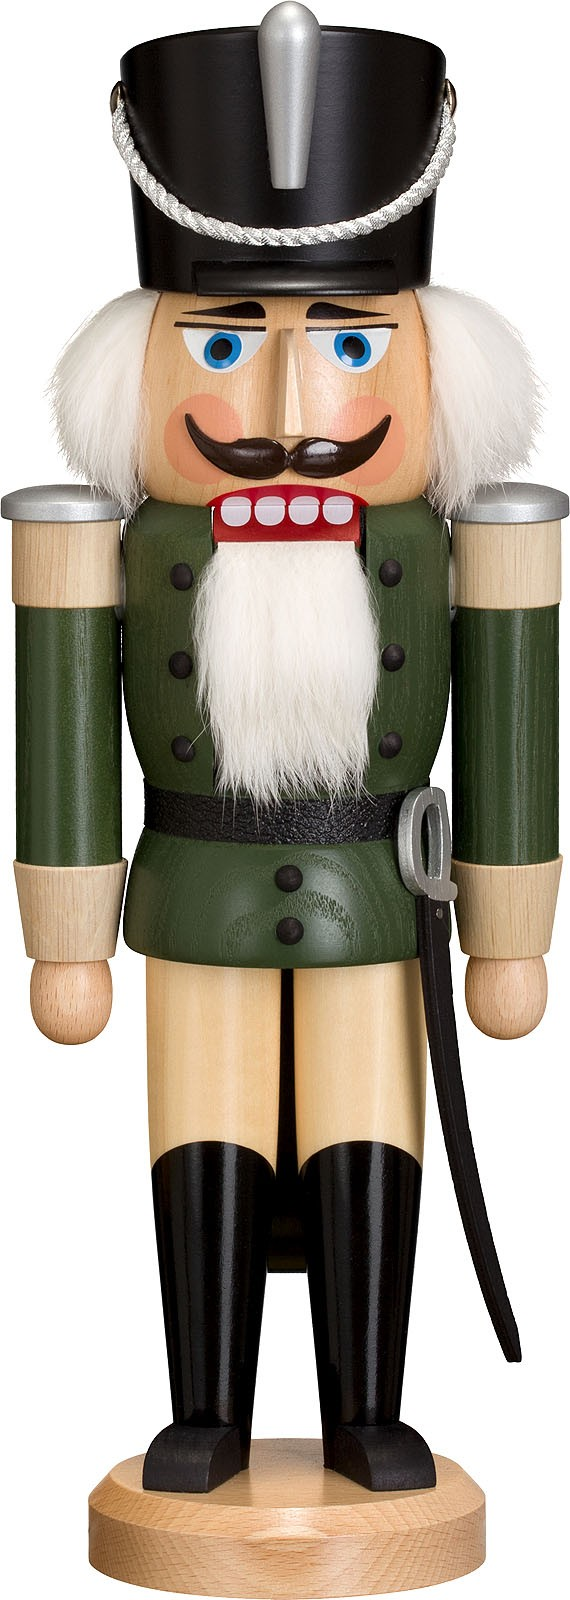 Nussknacker Husar, Esche lasiert, grün, 37 cm